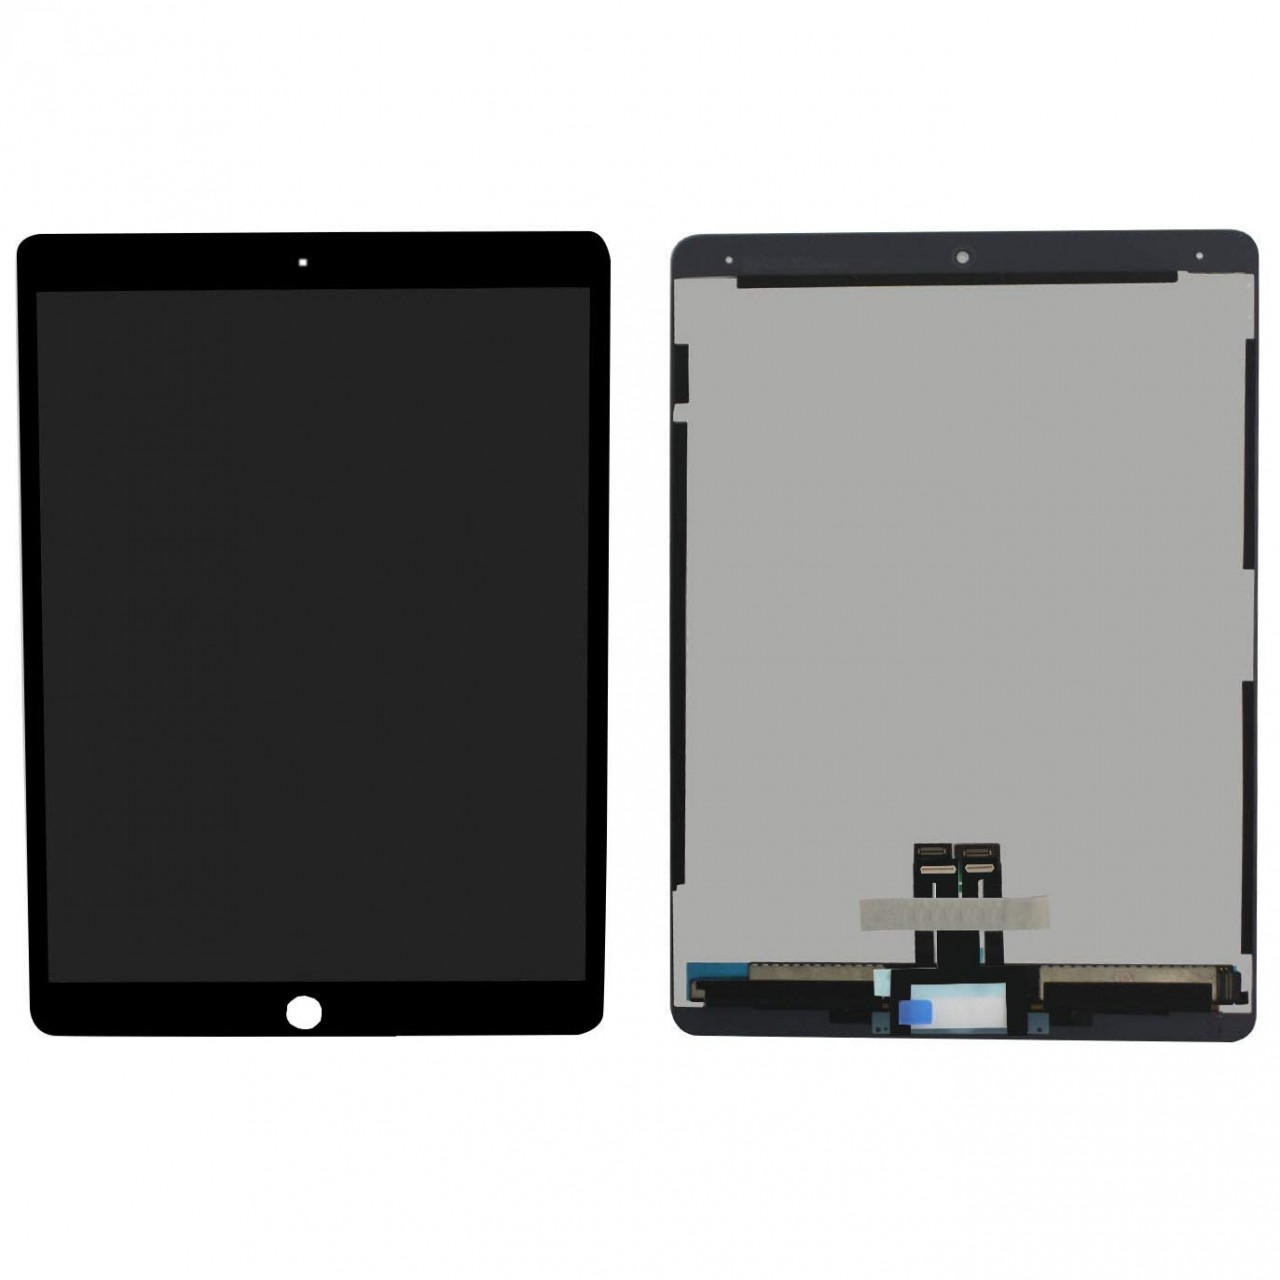 Ansamblu LCD Display Touchscreen Apple iPad Pro 10.5 2017 A1701 WiFi Negru imagine powerlaptop.ro 2021